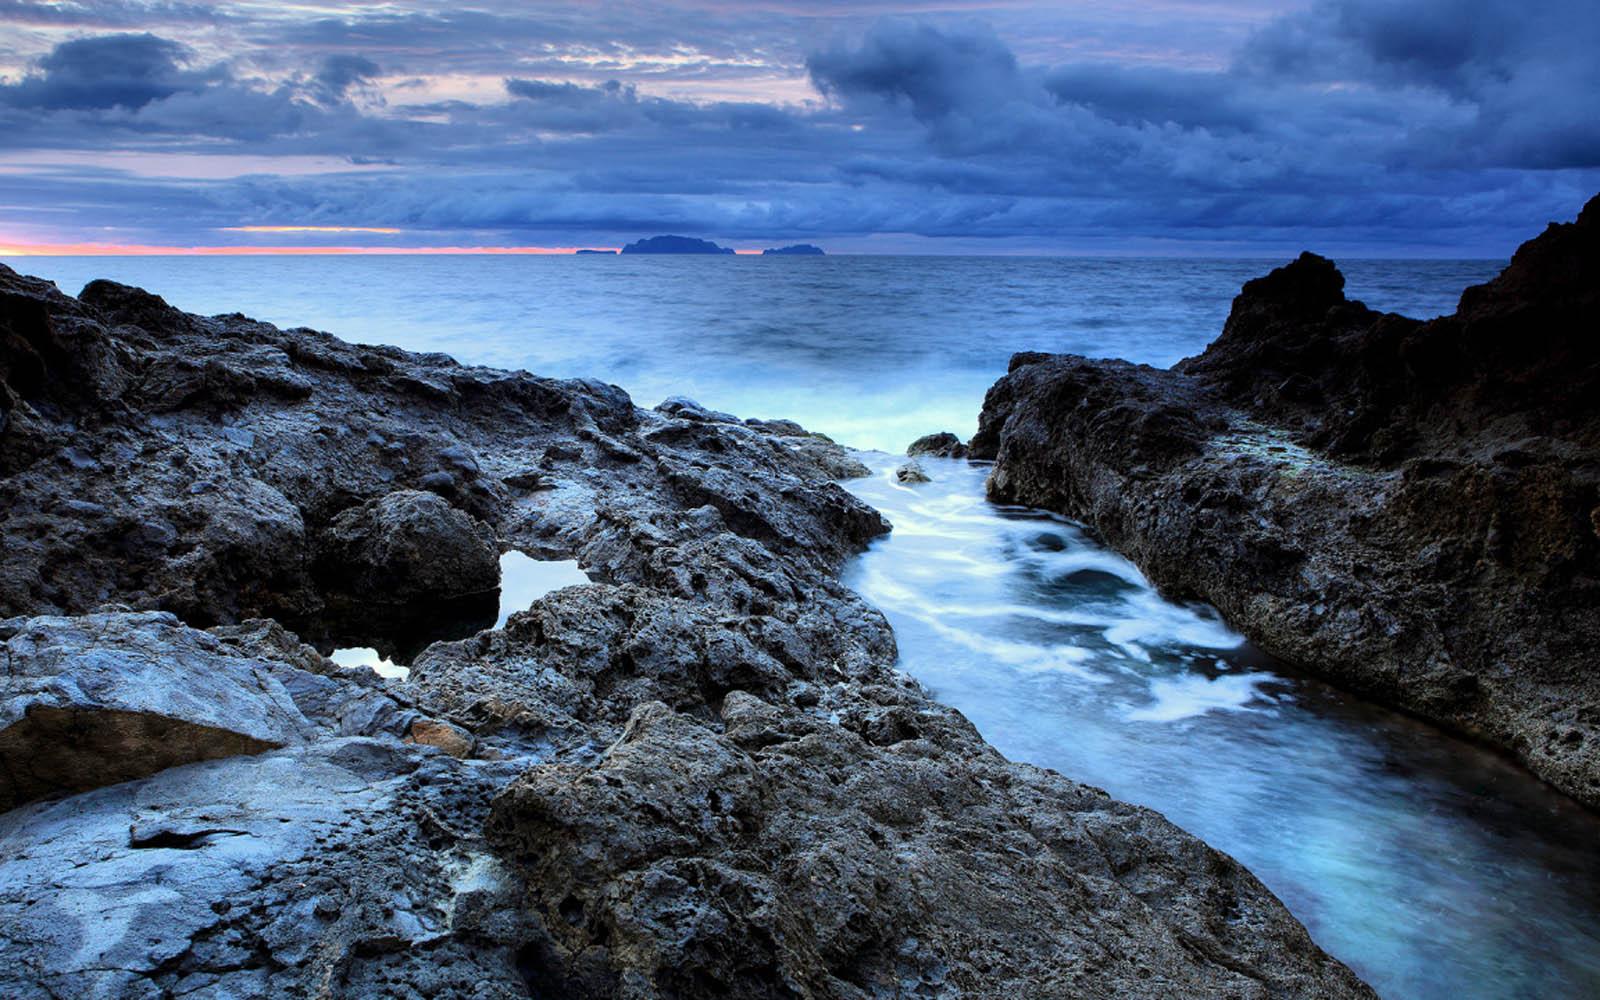 hd river ocean sea - photo #30